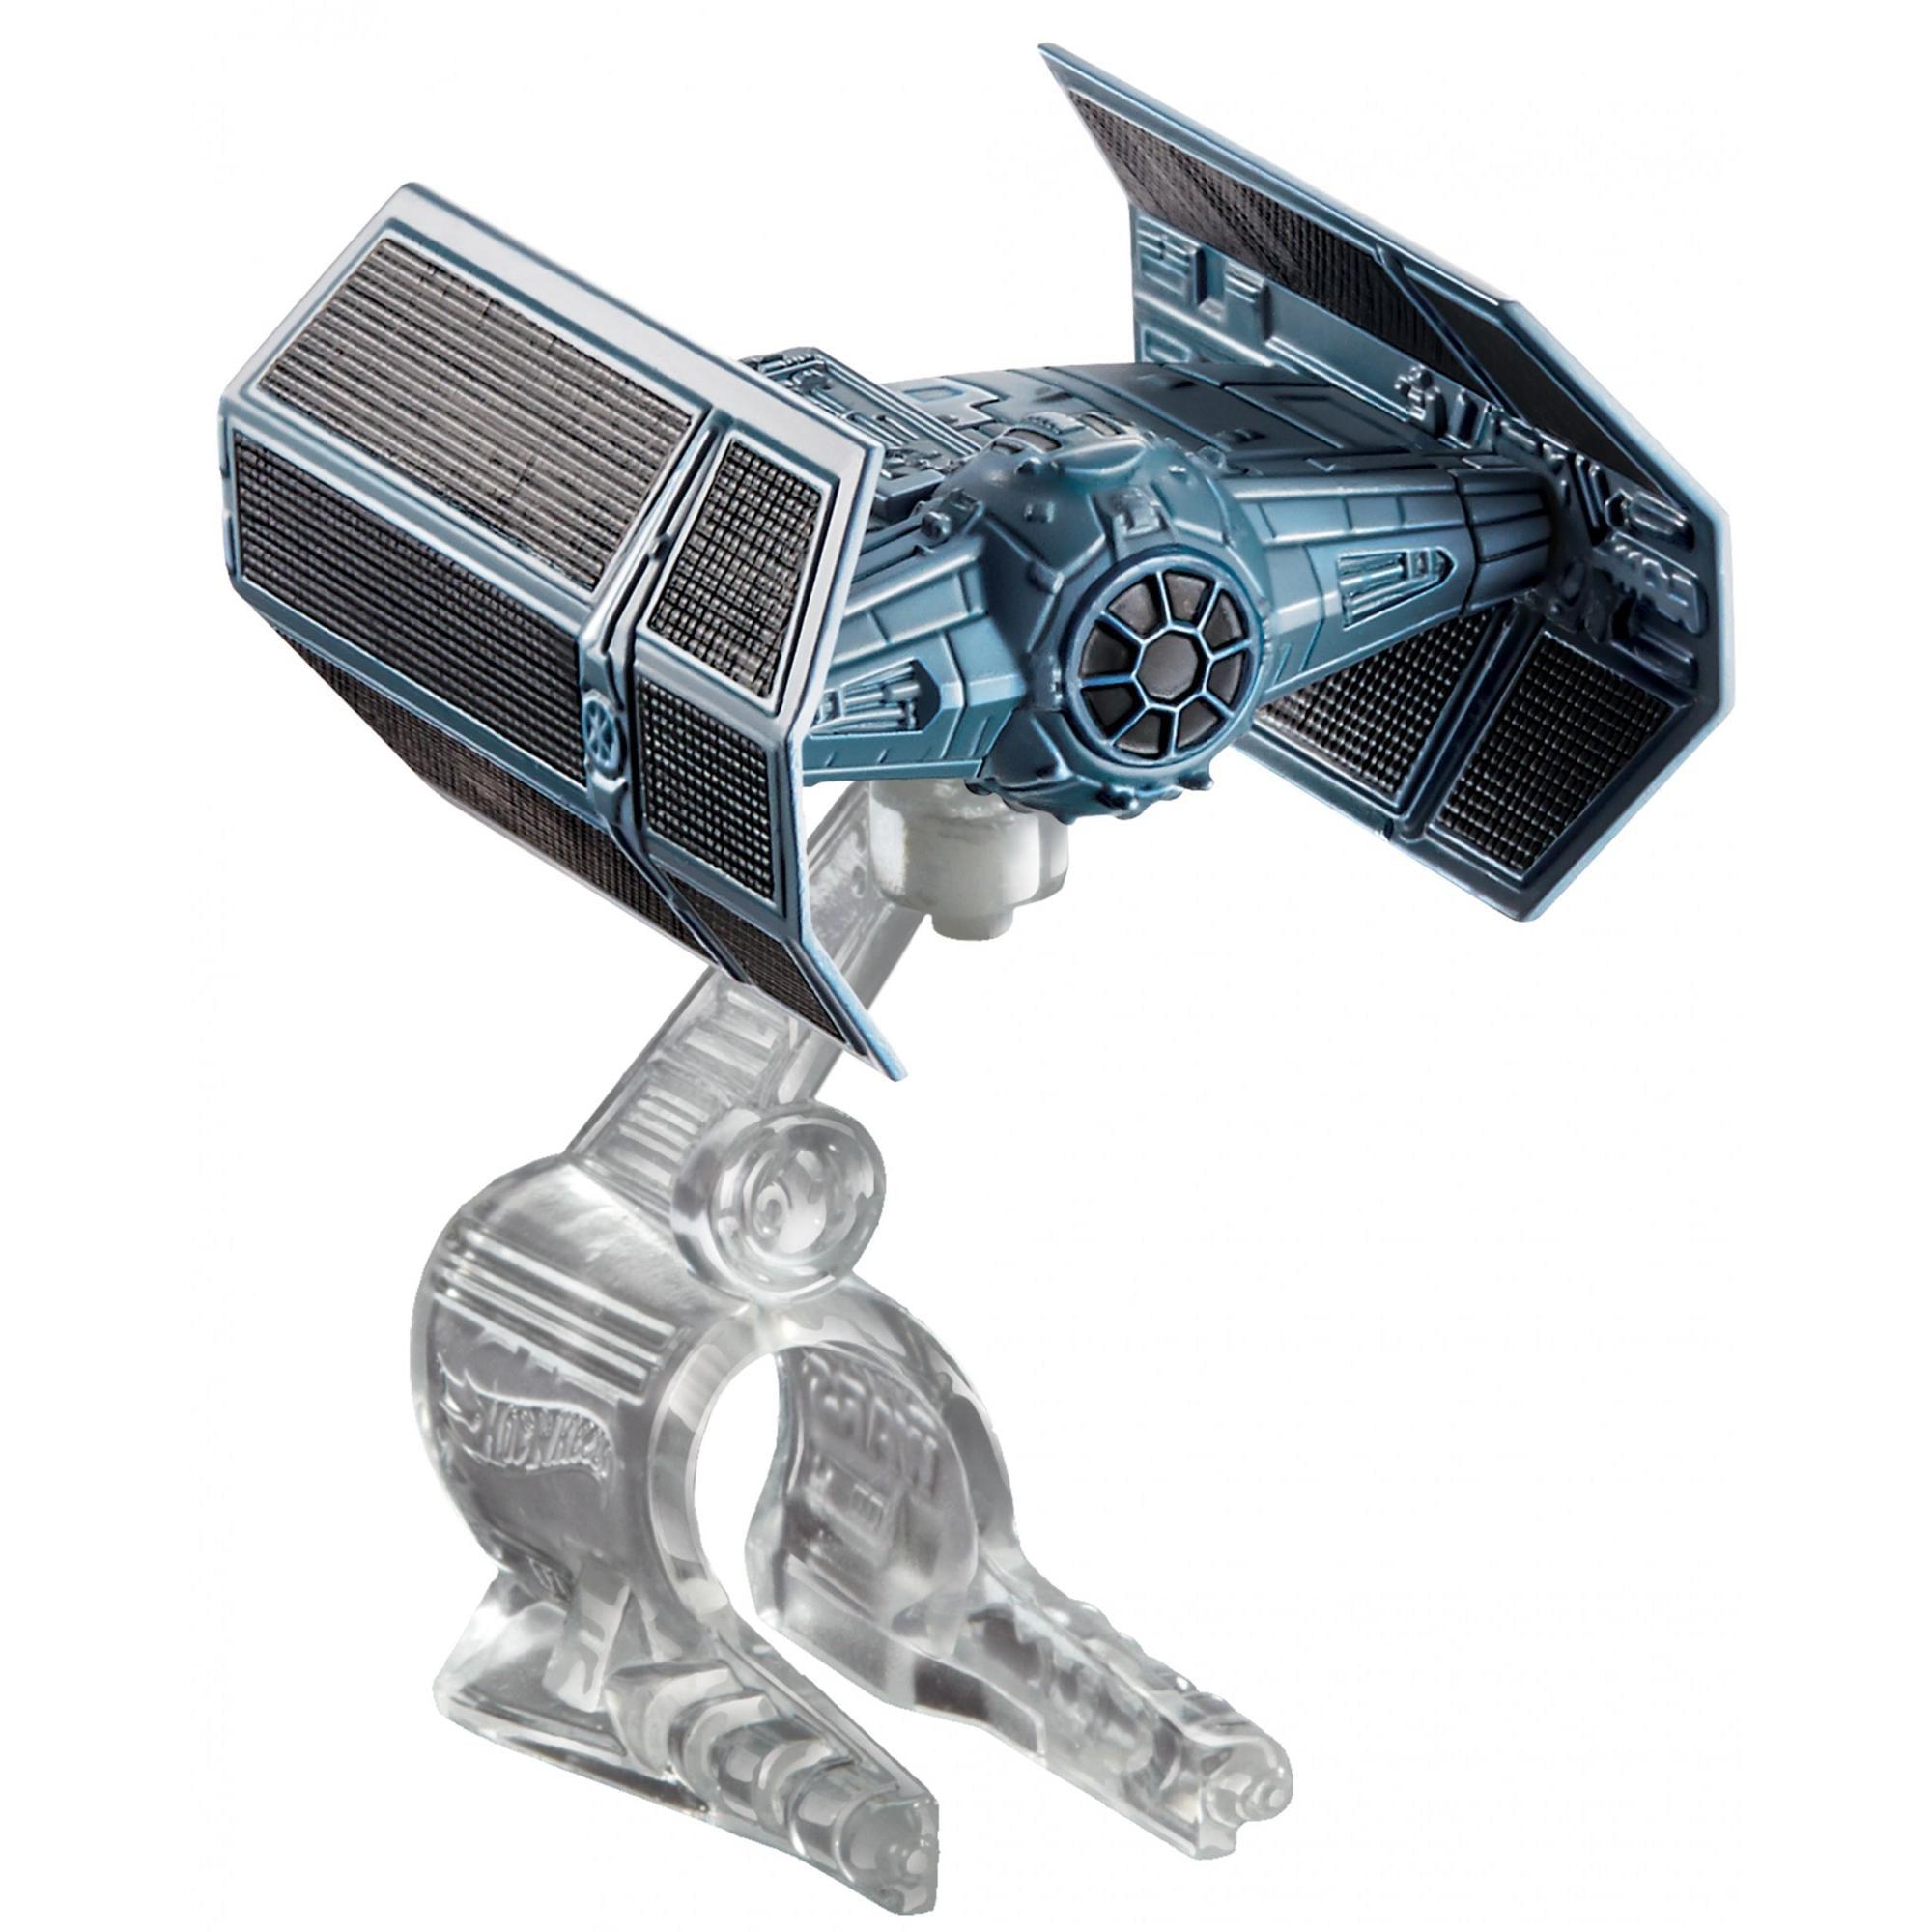 Hot Wheels Star Wars Starship TIE Fighter Advanced X1